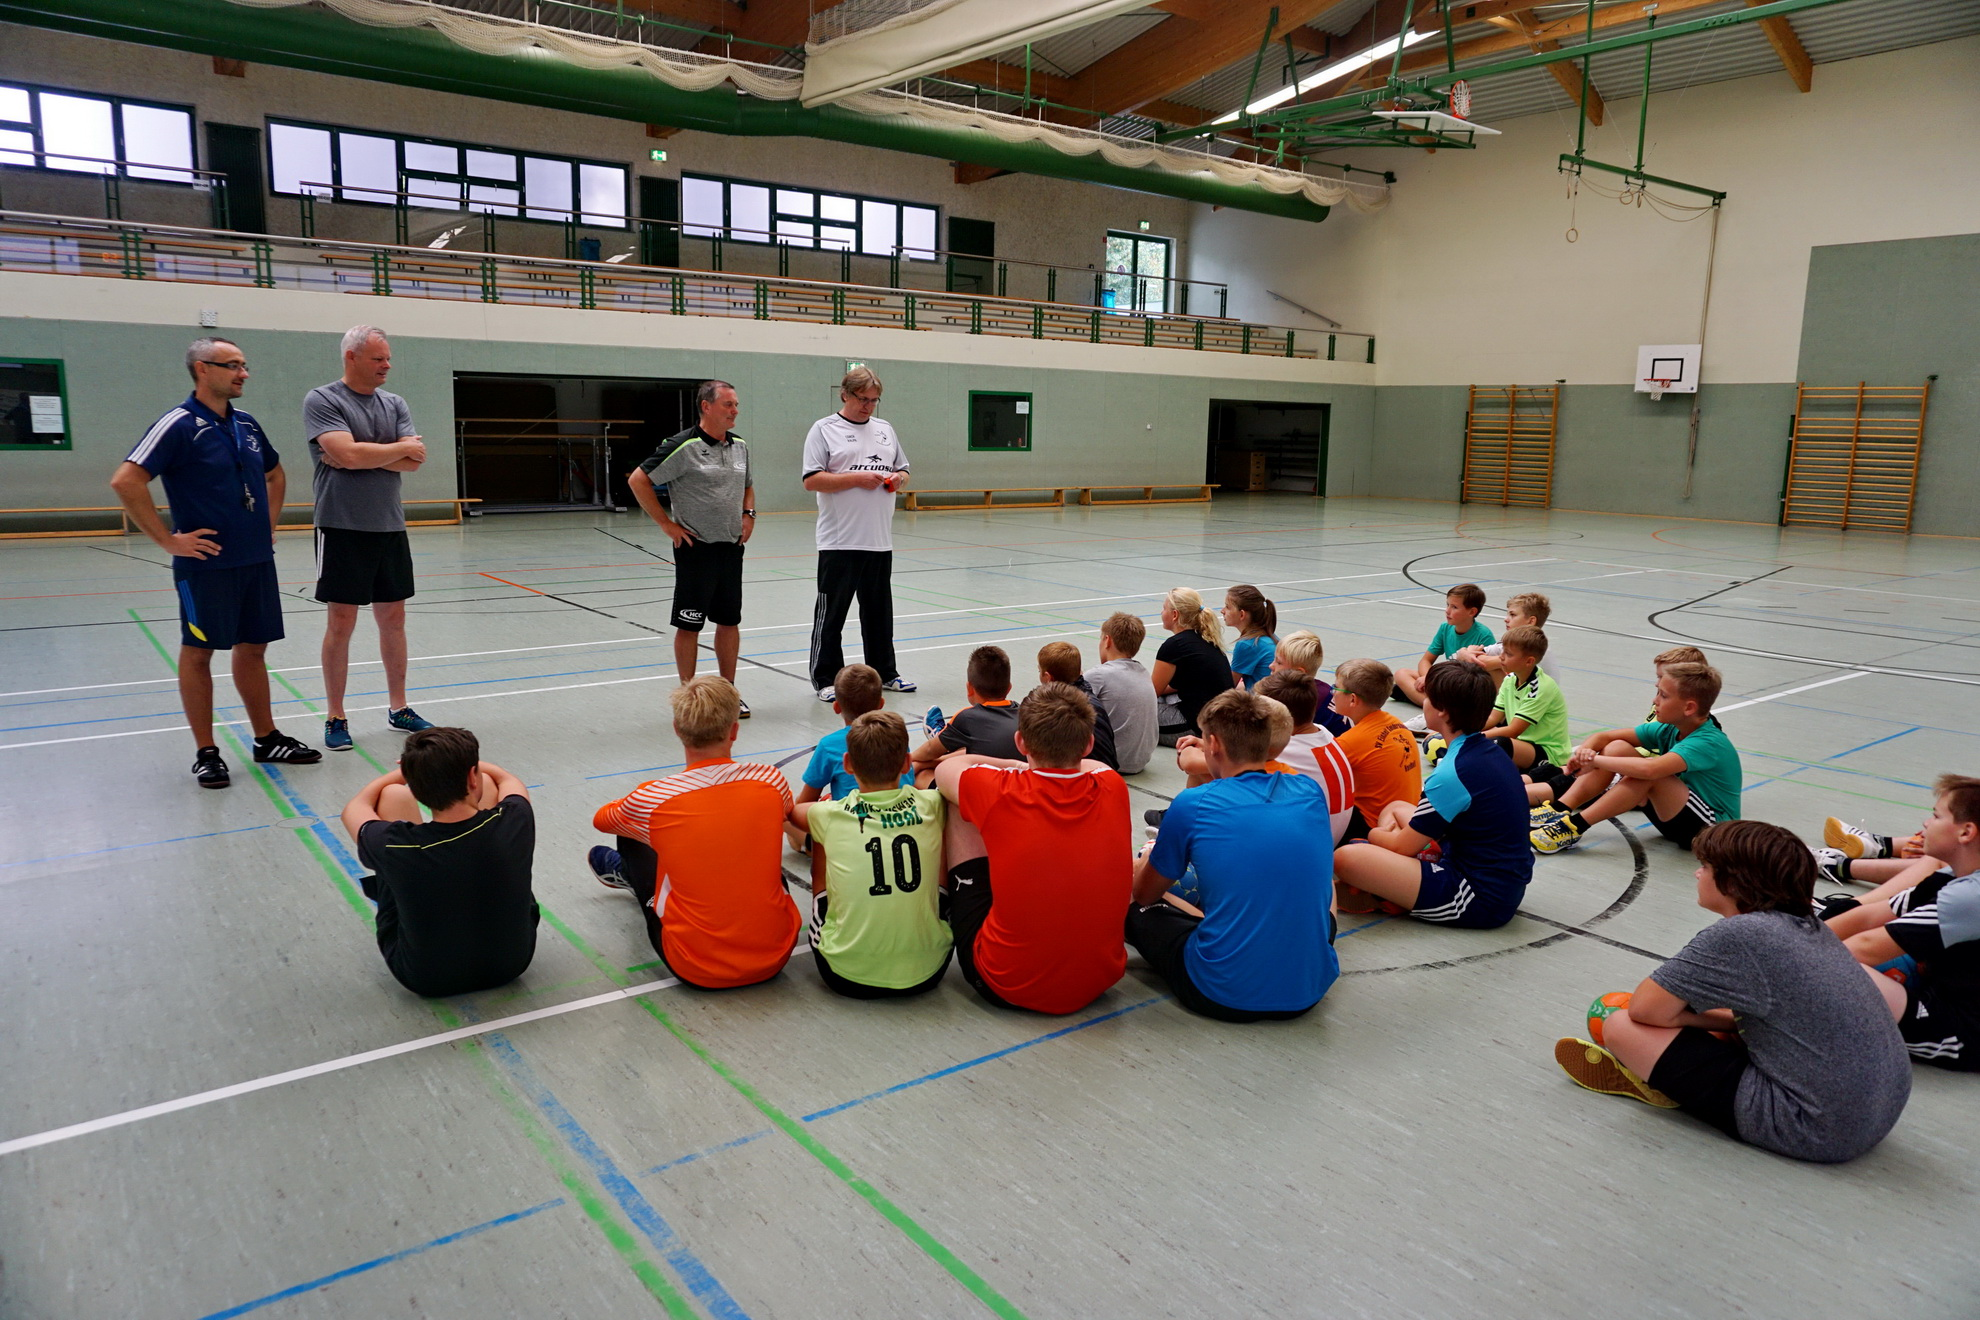 201808_Handballcamp_SDH_MG_006w